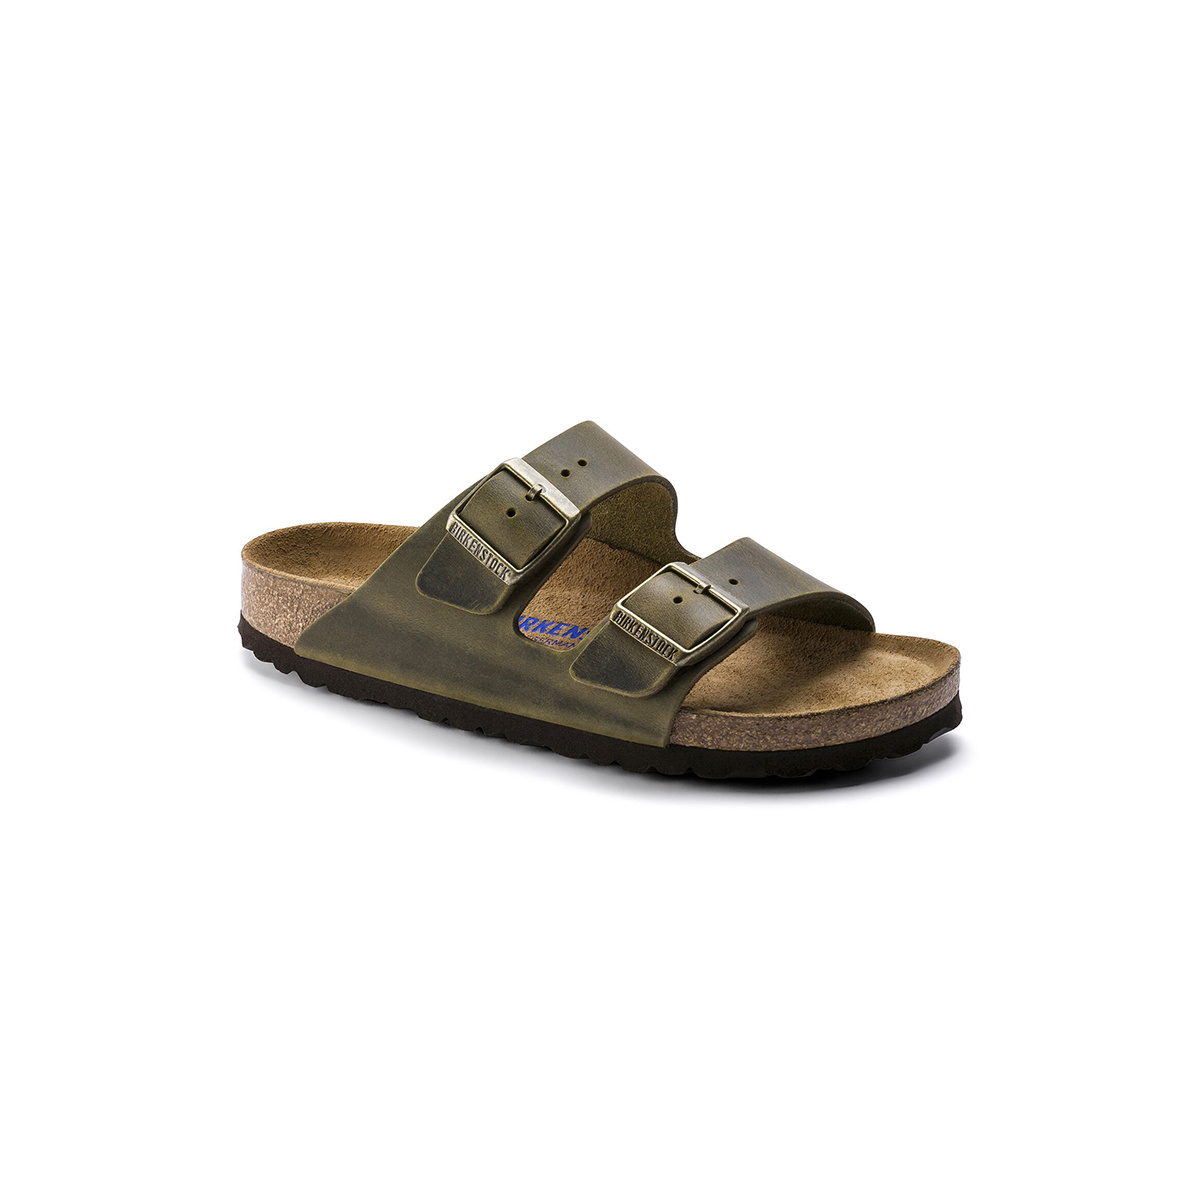 Birkenstock Arizona Soft Footbed Oiled Leather-Regular